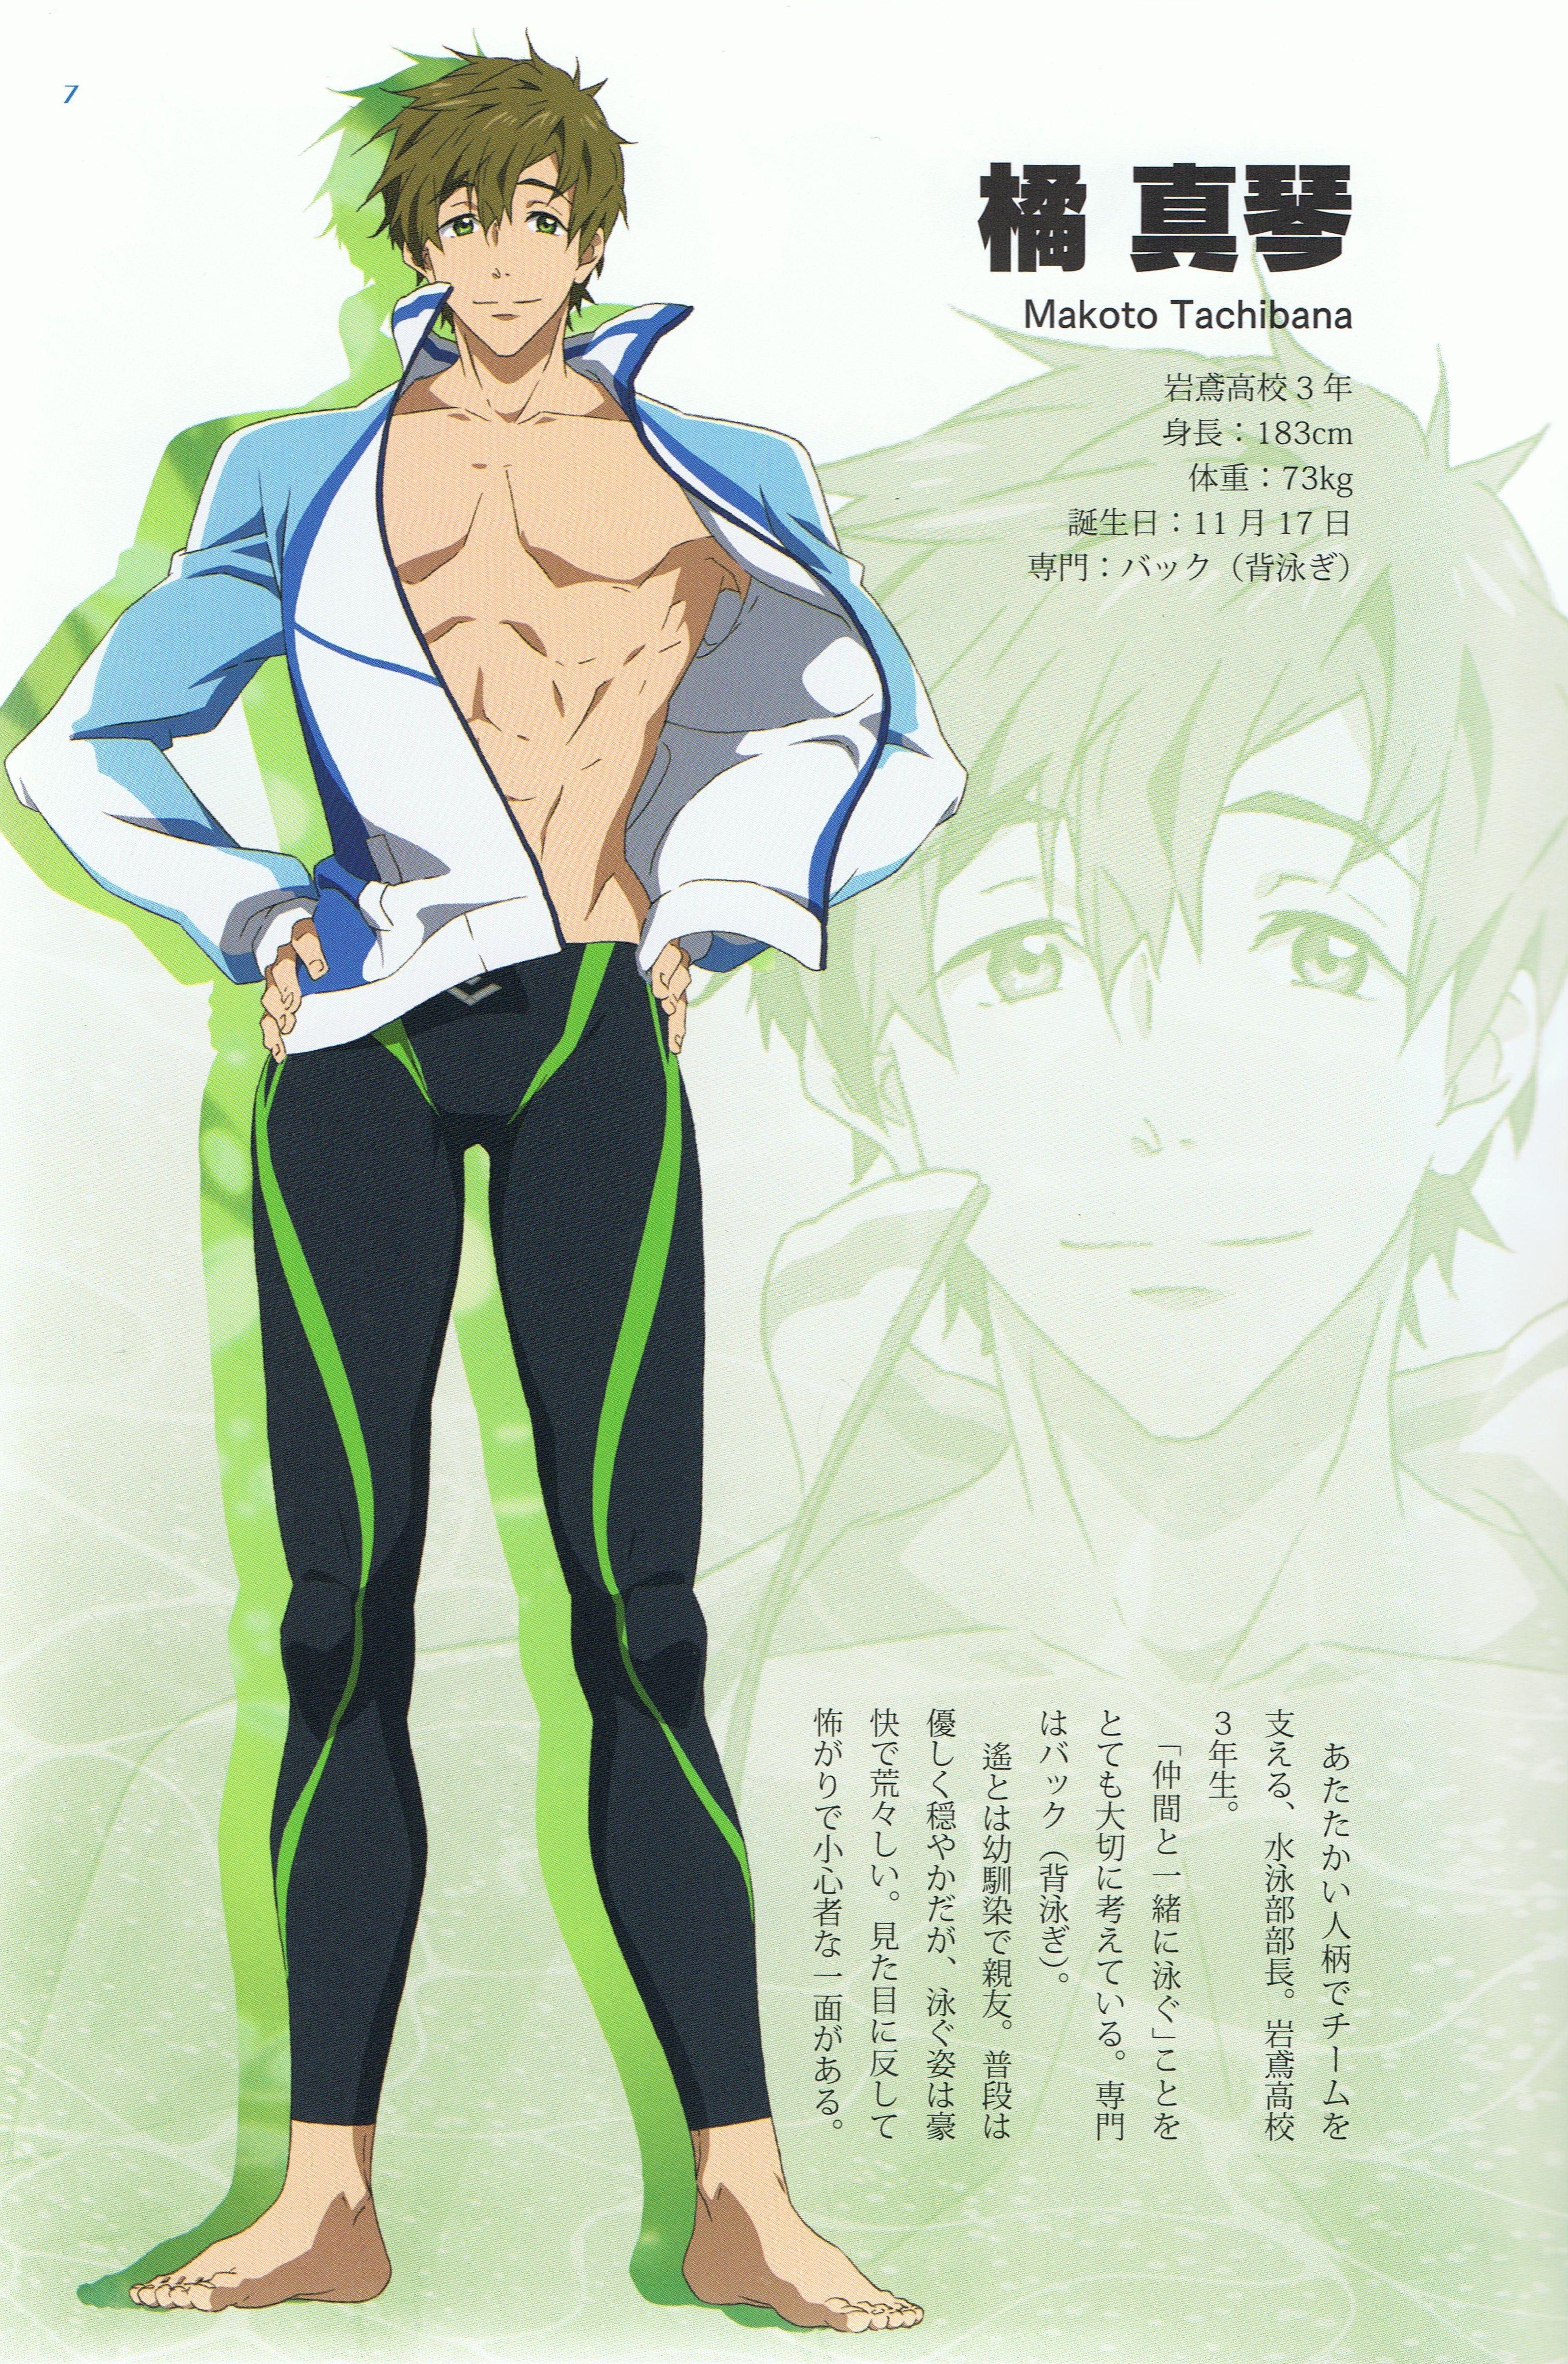 Tachibana Makoto/1770665 Zerochan Anime masculino